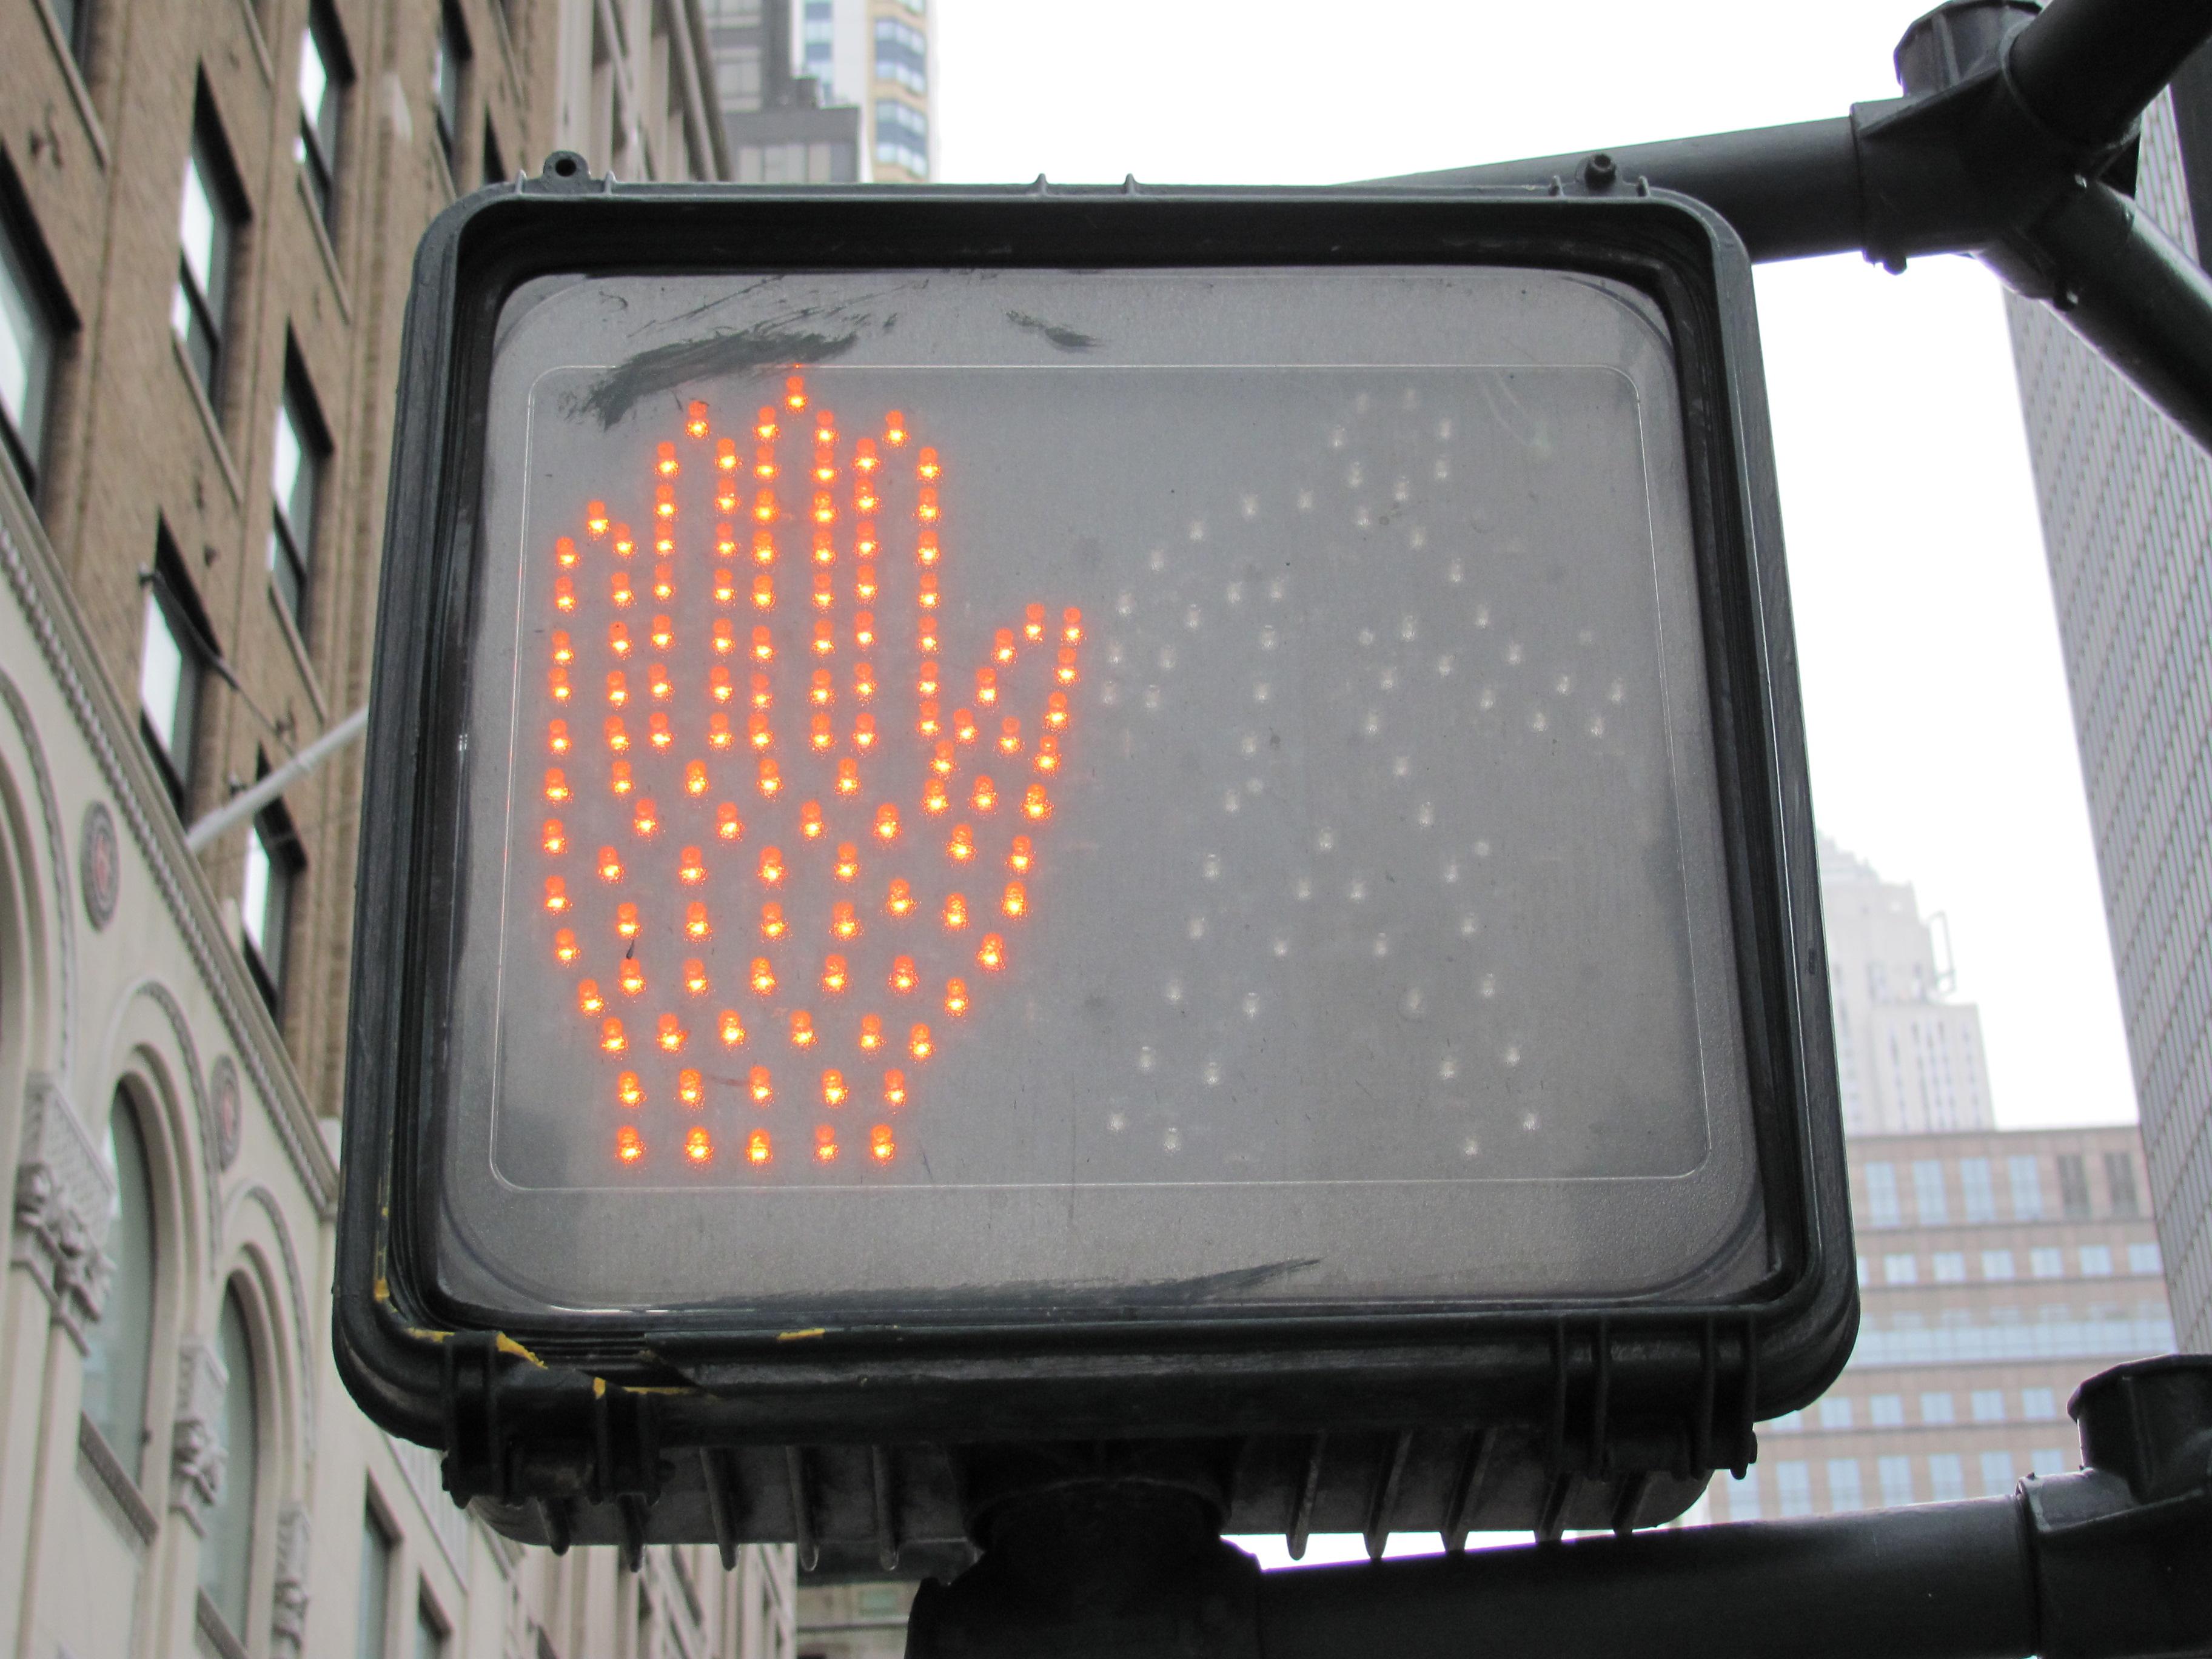 Pedestrian crosswalk sign (wait)